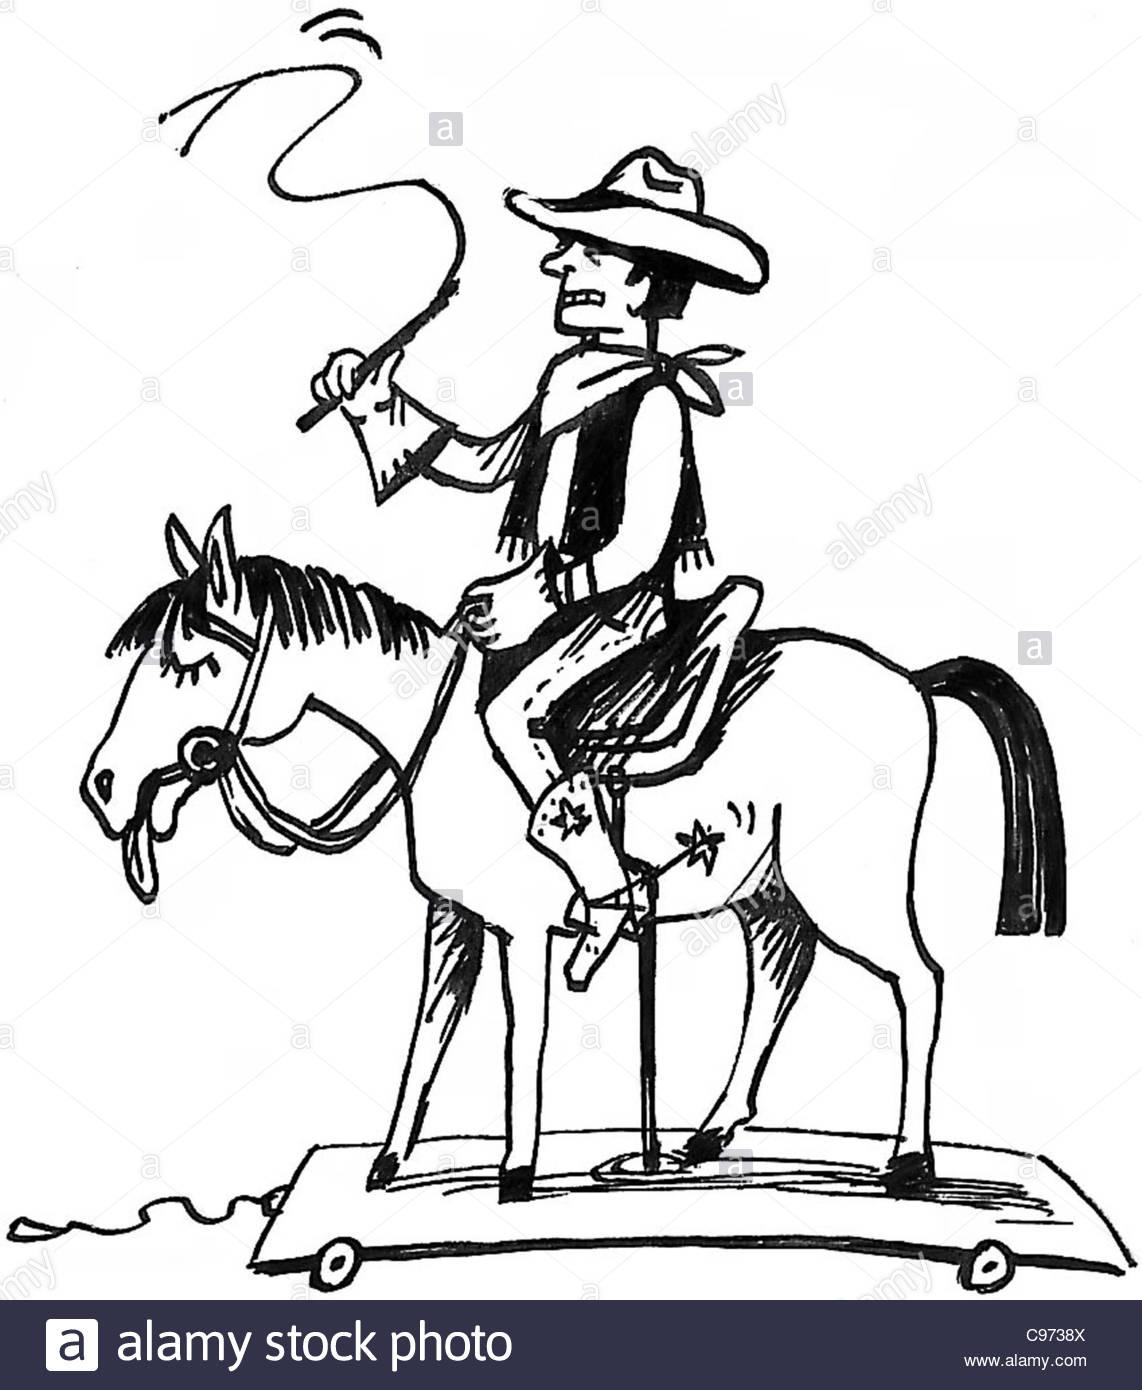 Cowboy on toy horse stock image